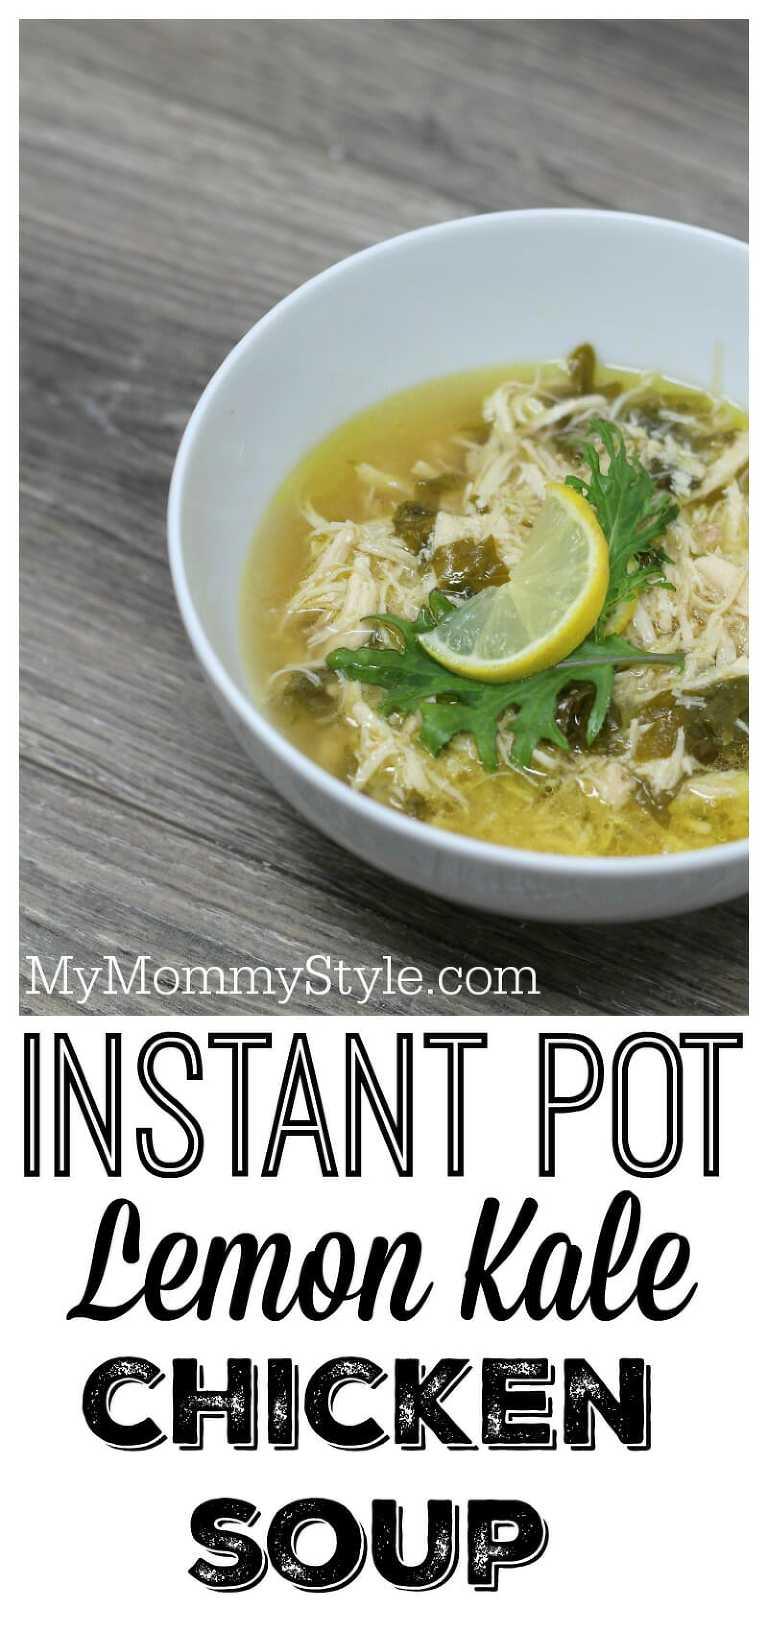 Instant Pot Lemon Kale Chicken Soup Pin